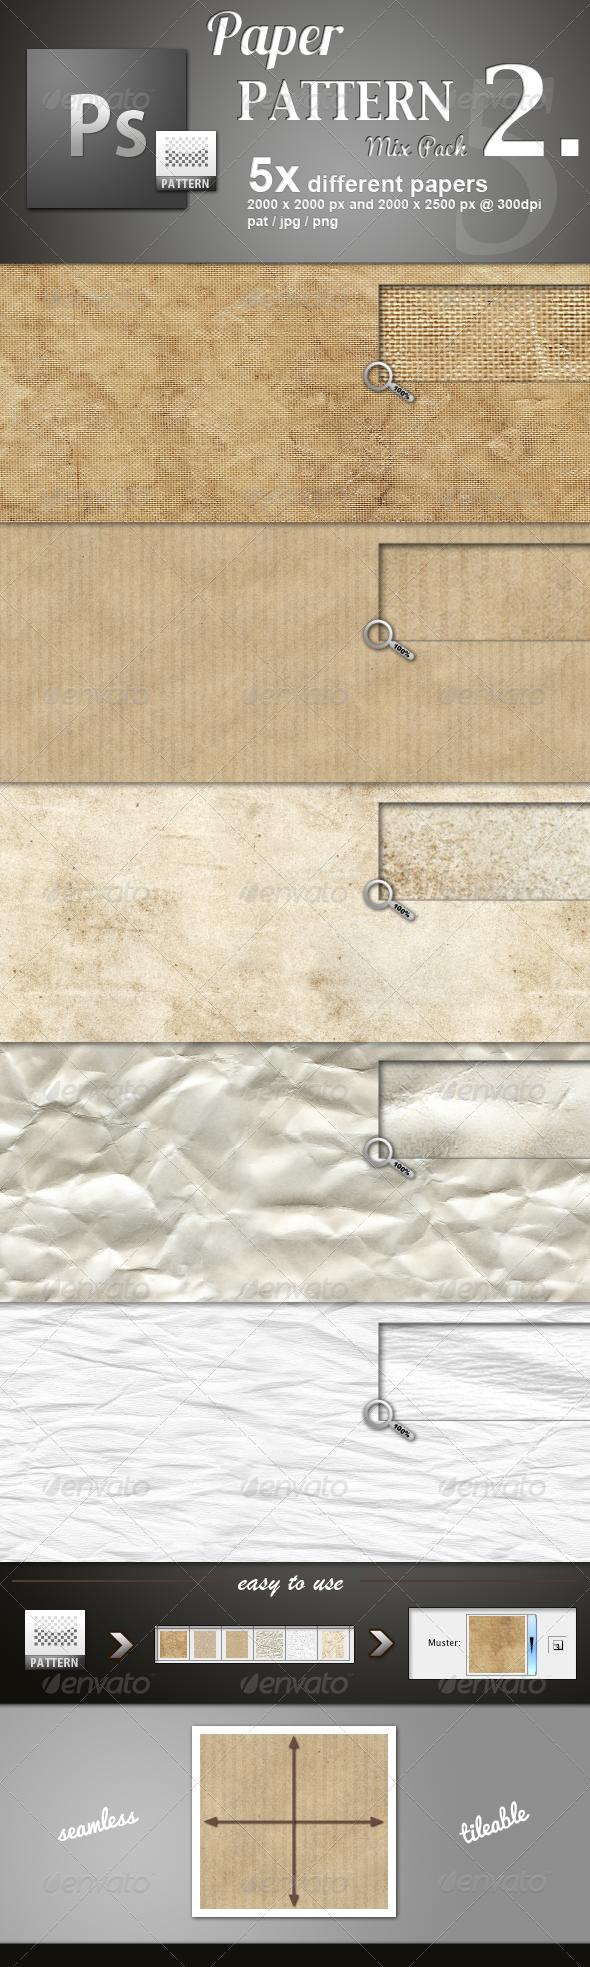 Paper Pattern MIX 2 - Miscellaneous Textures / Fills / Patterns